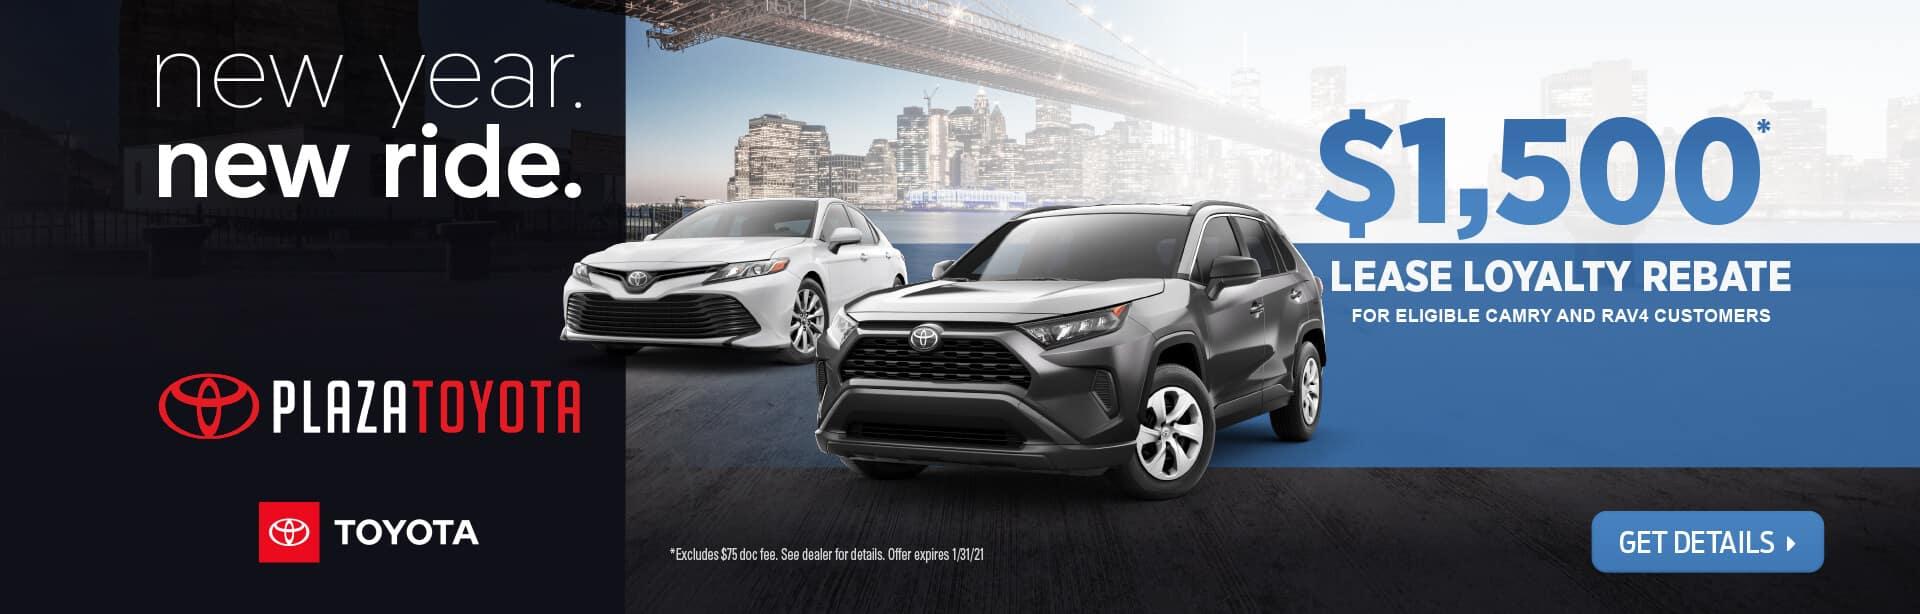 2020.12.28-Plaza-Toyota-JAN-Web-Banners-1-S50183vw-2